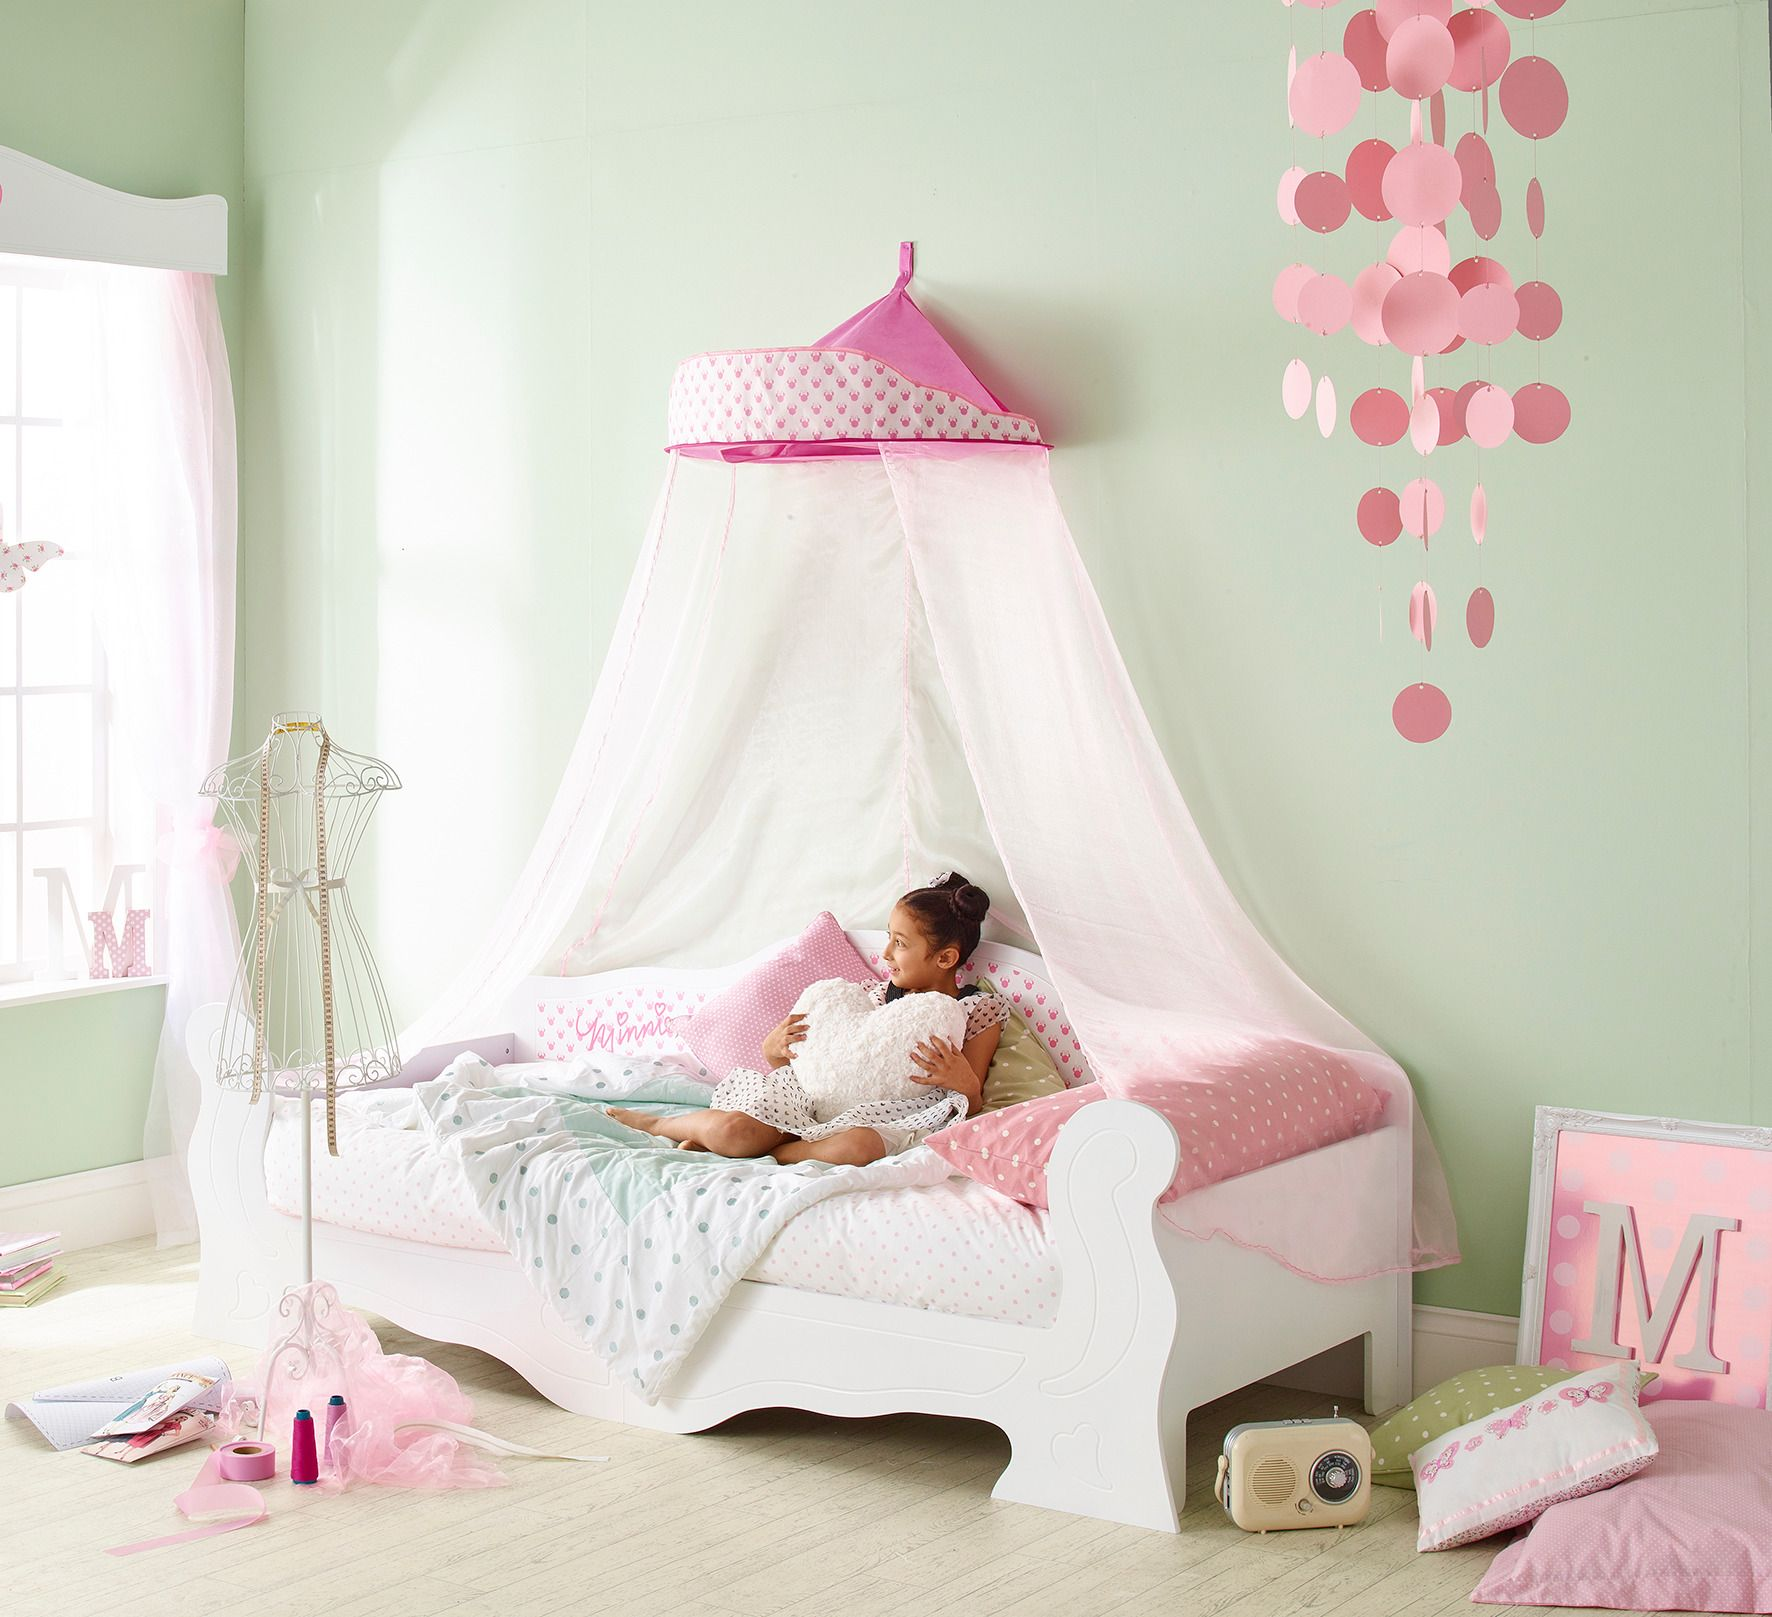 Cama infantil minnie mouse 90 x 190 cm un modelo de cama - Dormitorio infantil original ...